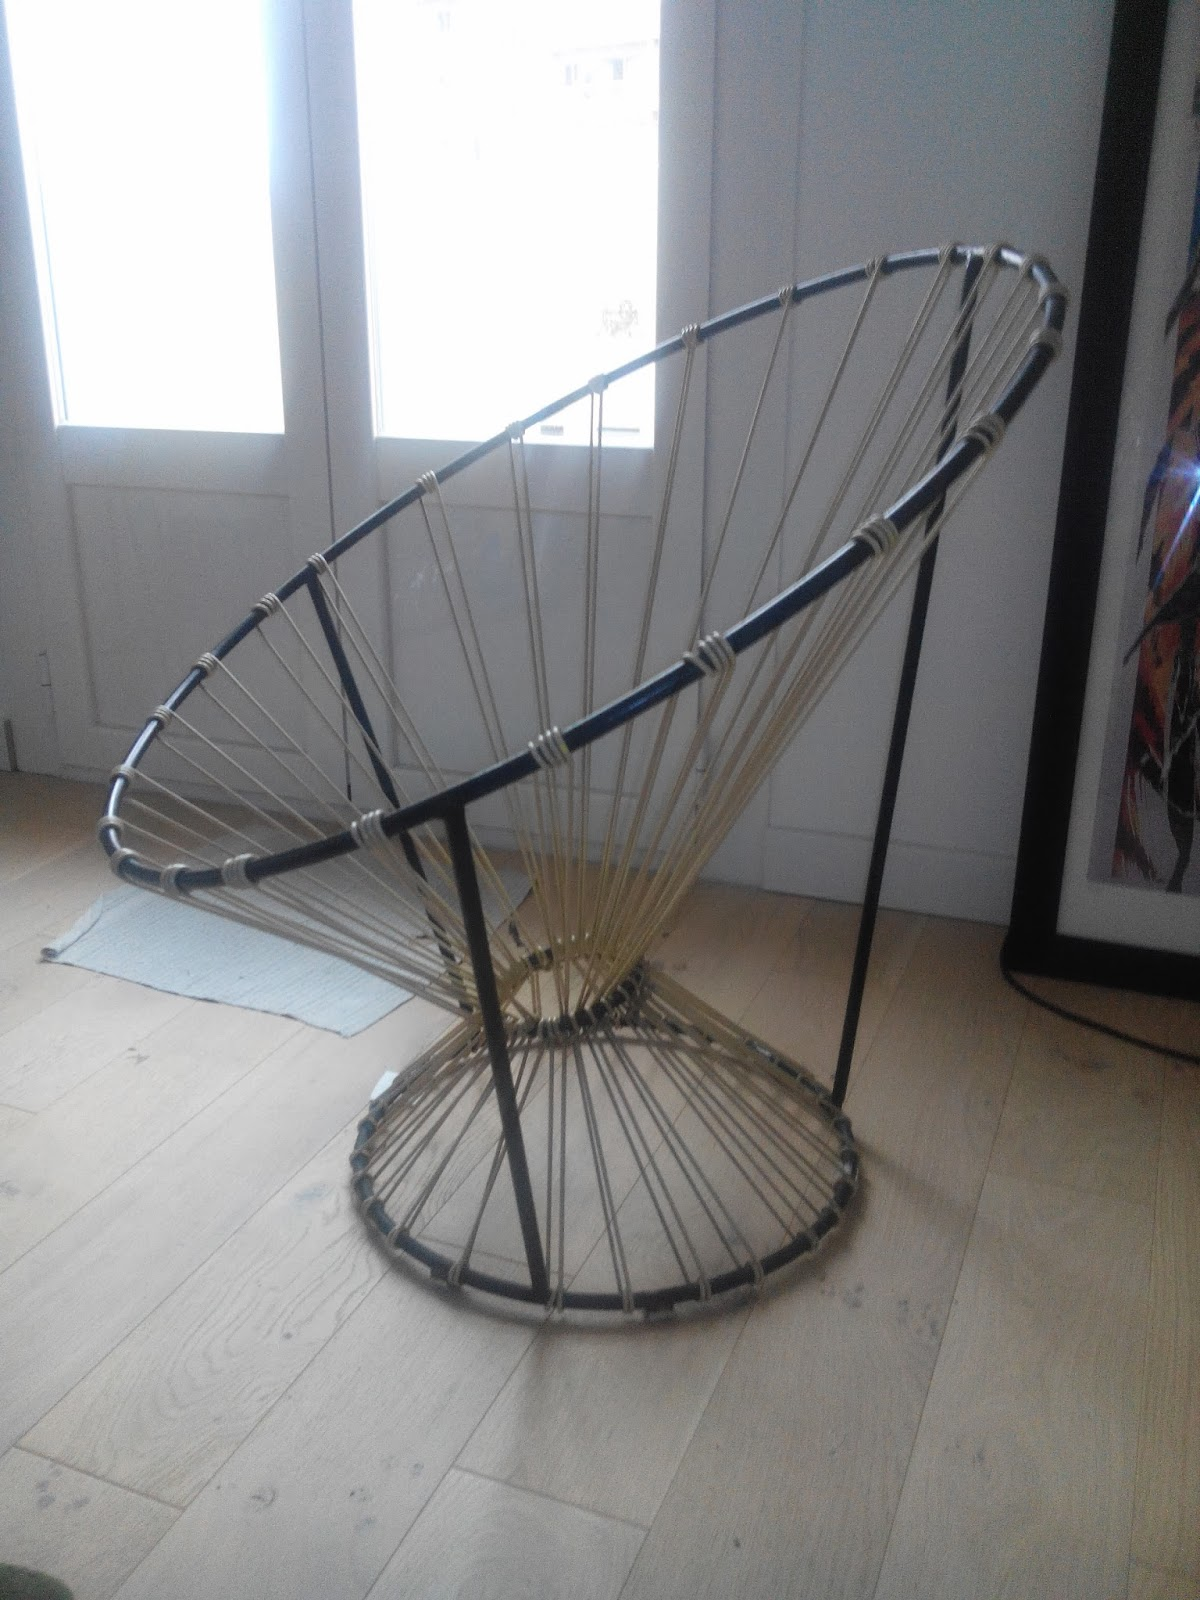 mobilier scoubidou r novation de chaise scoubidou. Black Bedroom Furniture Sets. Home Design Ideas